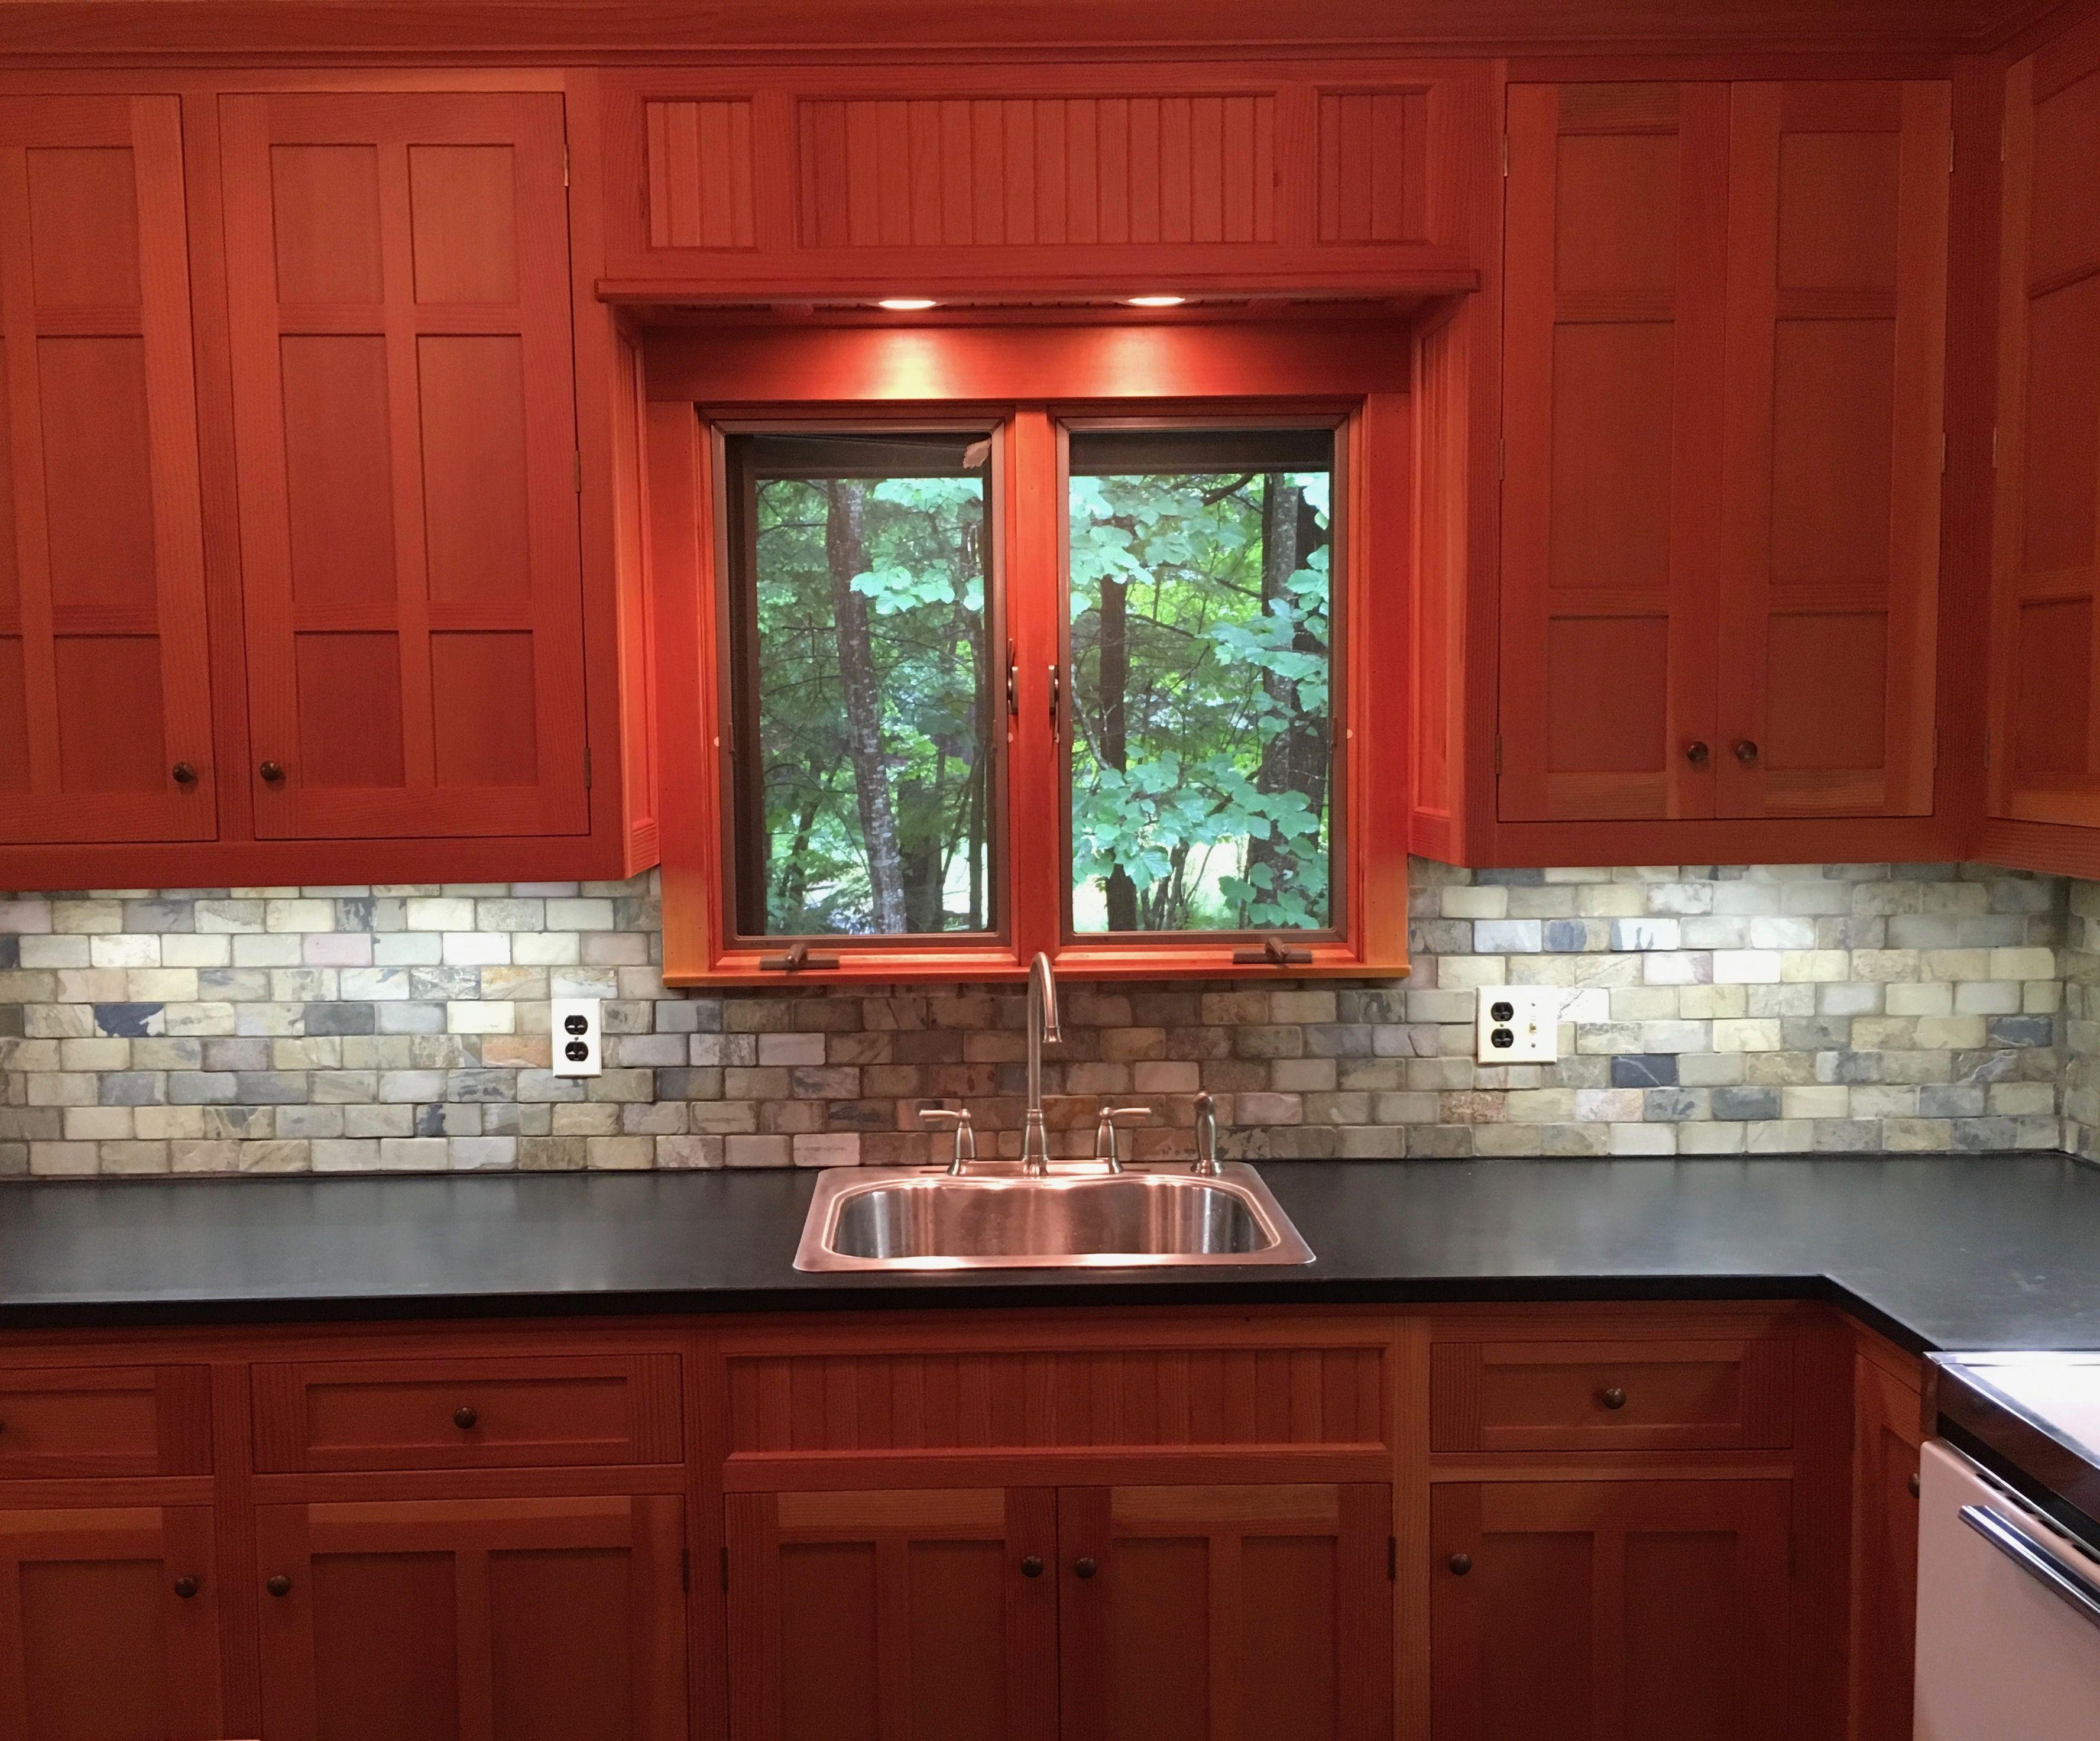 Handmade Custom Kitchen Cabinets By Neal Barrett Woodworking